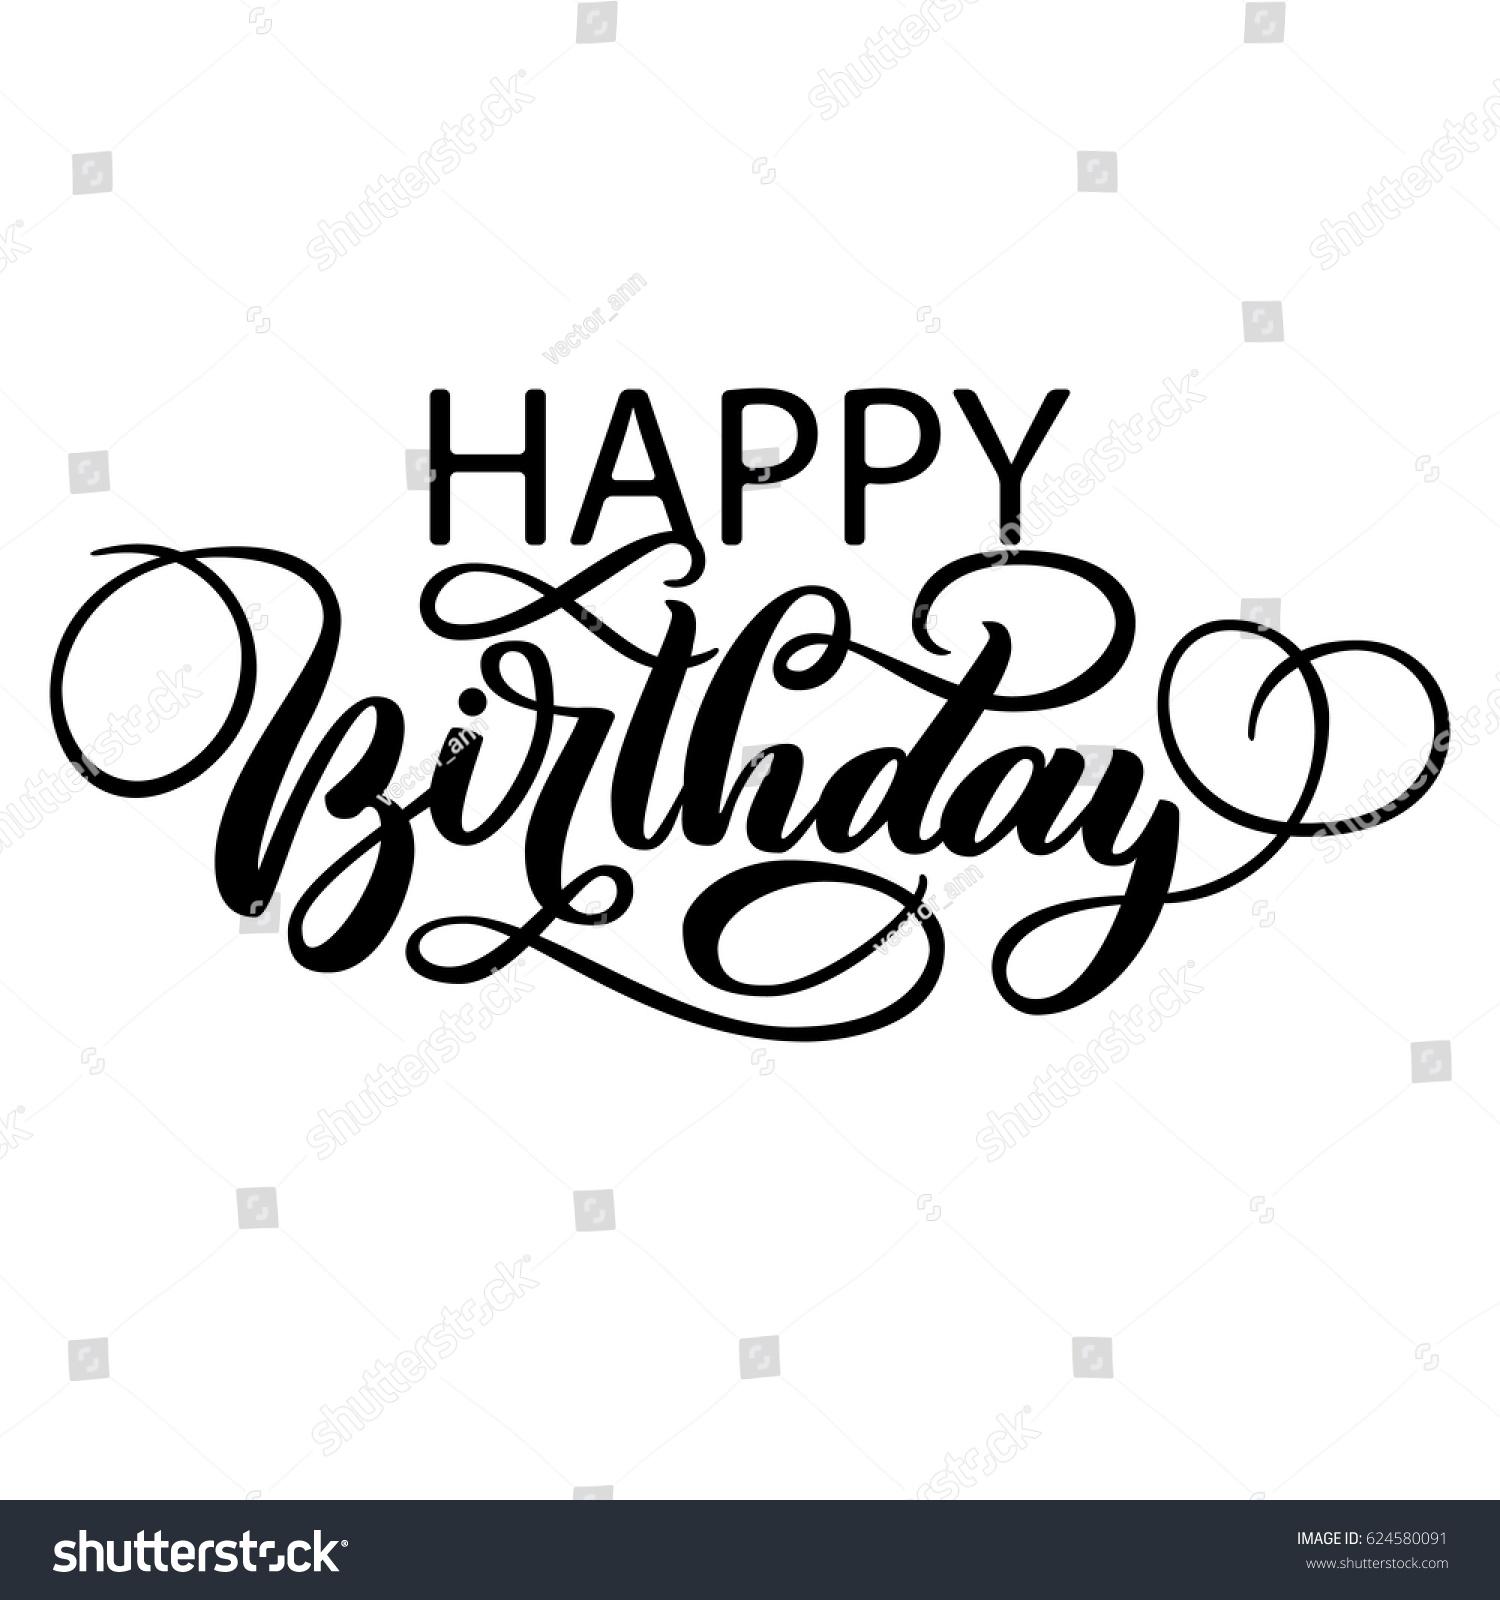 Happy Birthday Fancy Vintage Hand Lettering Stock Vector 624580091